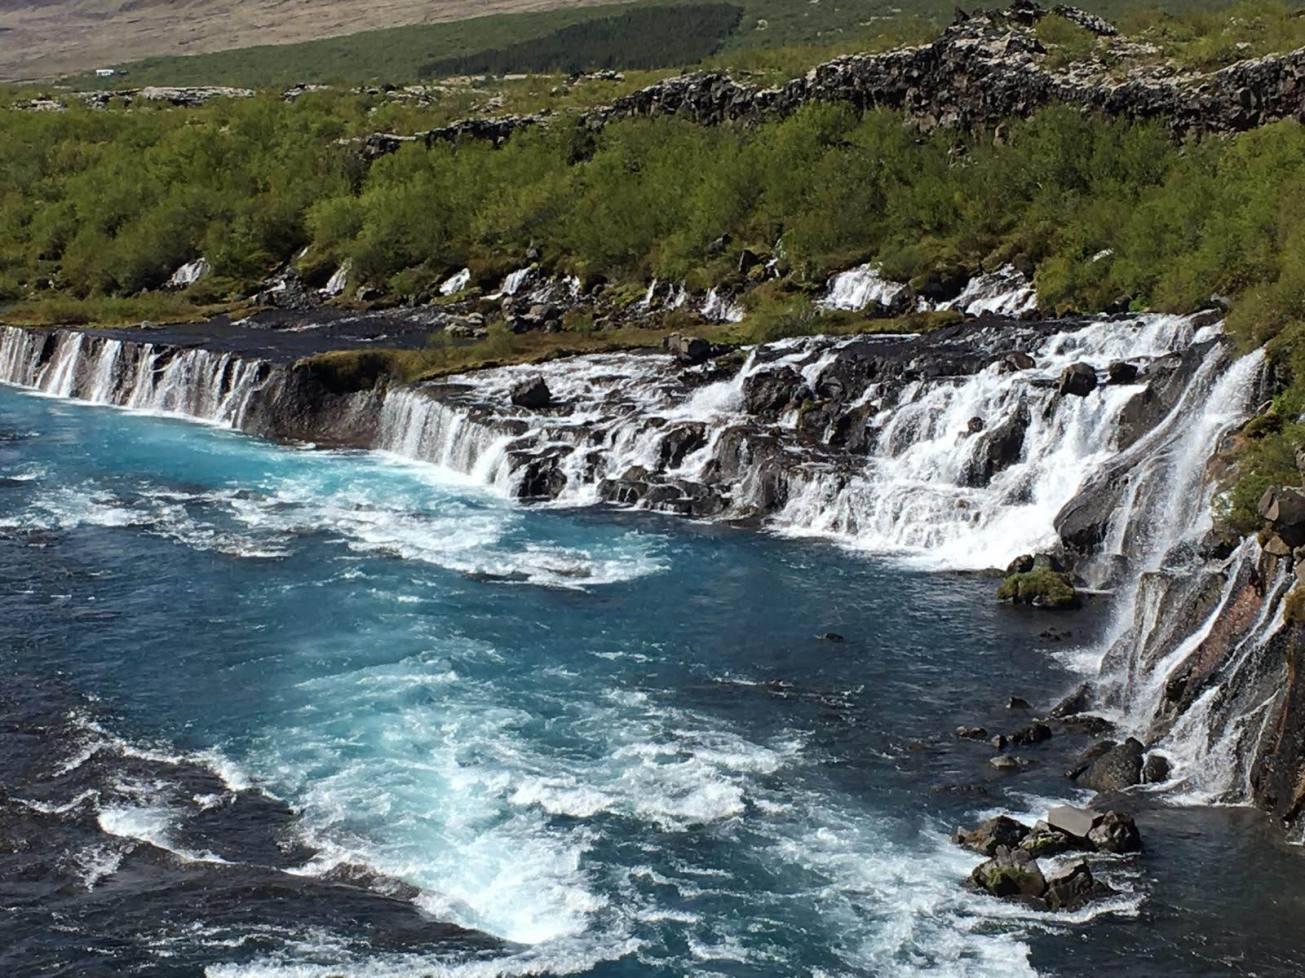 Barnafoss_-_Childrens_Falls_Flow_into_Hvita_River